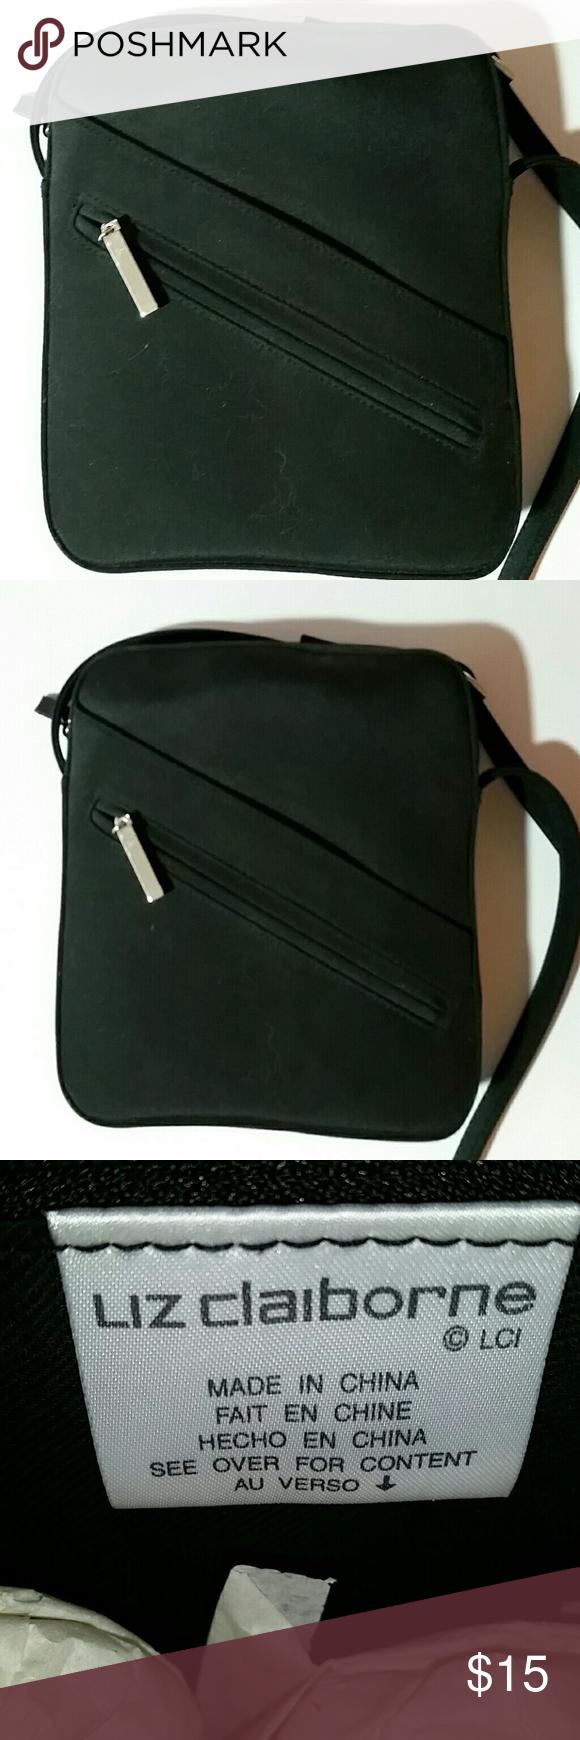 "Liz Claiborne Black Microfiber Crossbody Bag Liz Claiborne, black, microfiber l, cross body bag. Front zip & top zip. About 7.5"" x 9"", 45"" adjustable strap. Zipper pocket inside. 55% cotton/45% polyester. Liz Claiborne Bags Crossbody Bags"